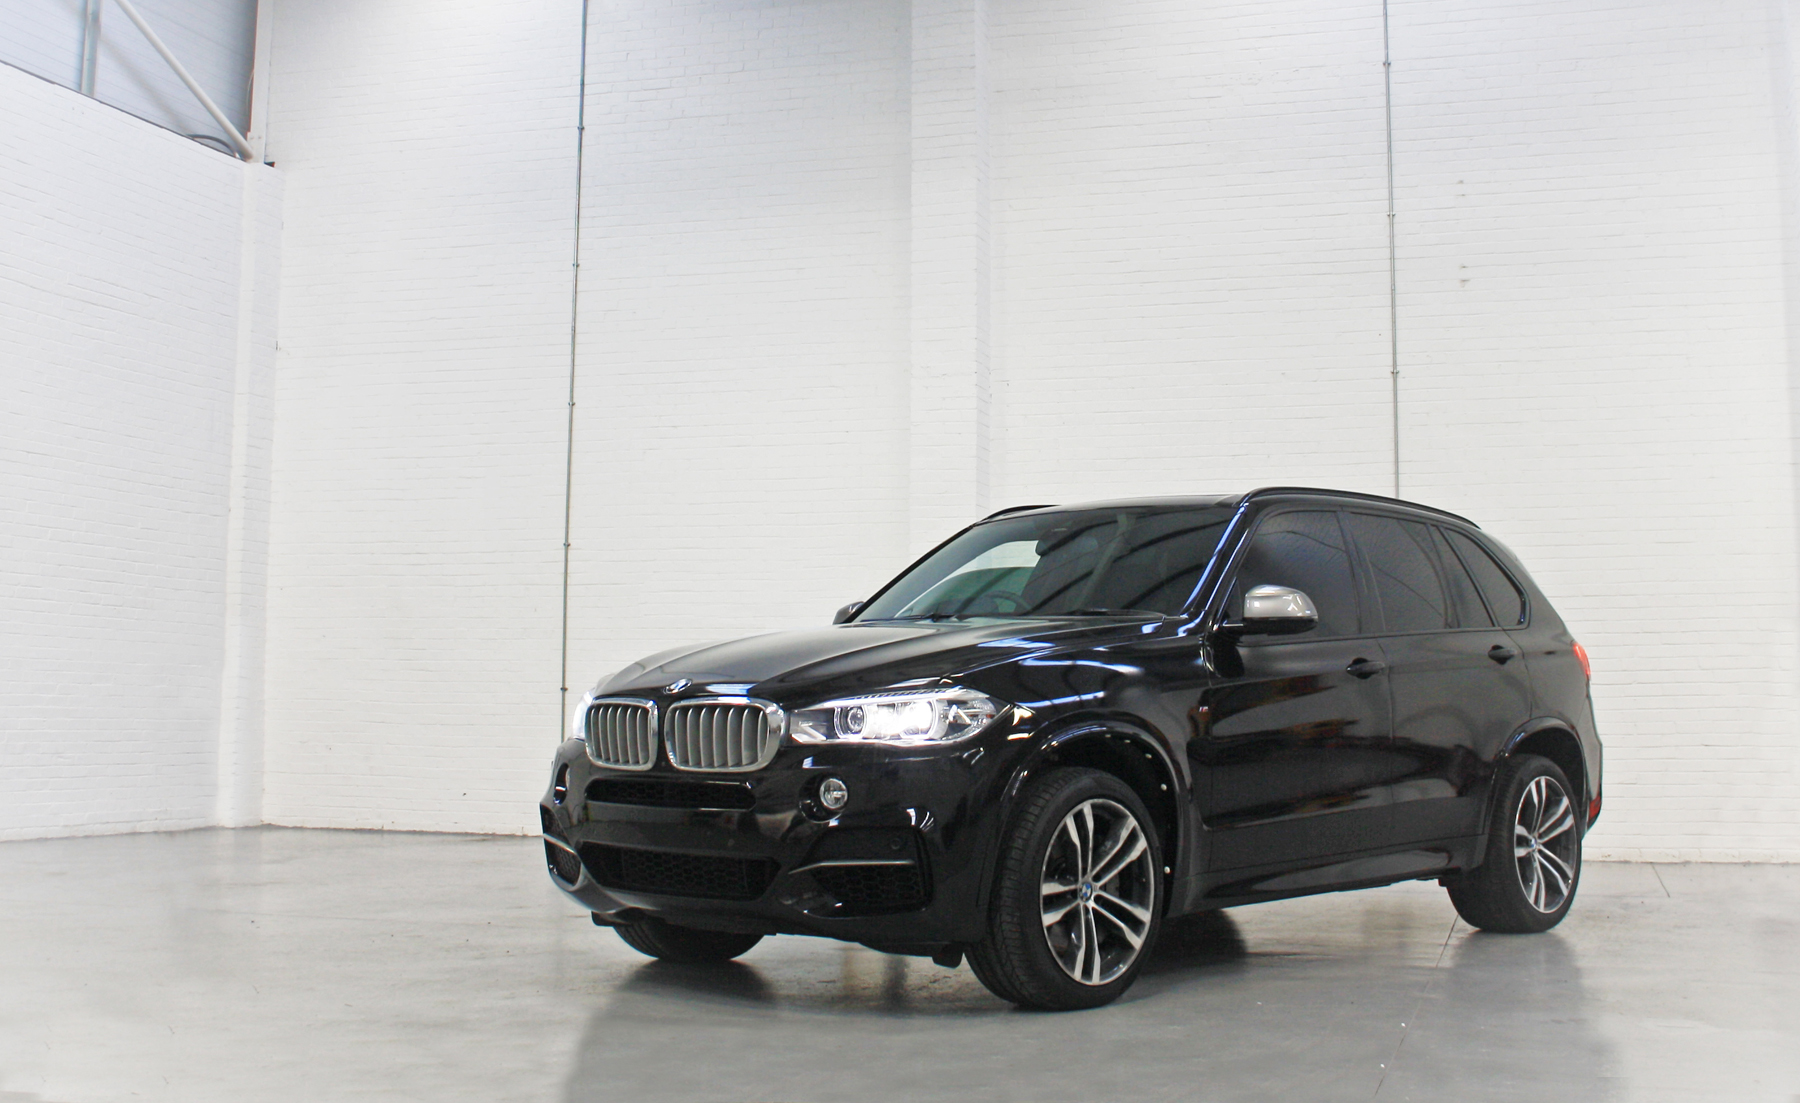 BMW X3 - Gloss Metallic Black 3m1080-G212